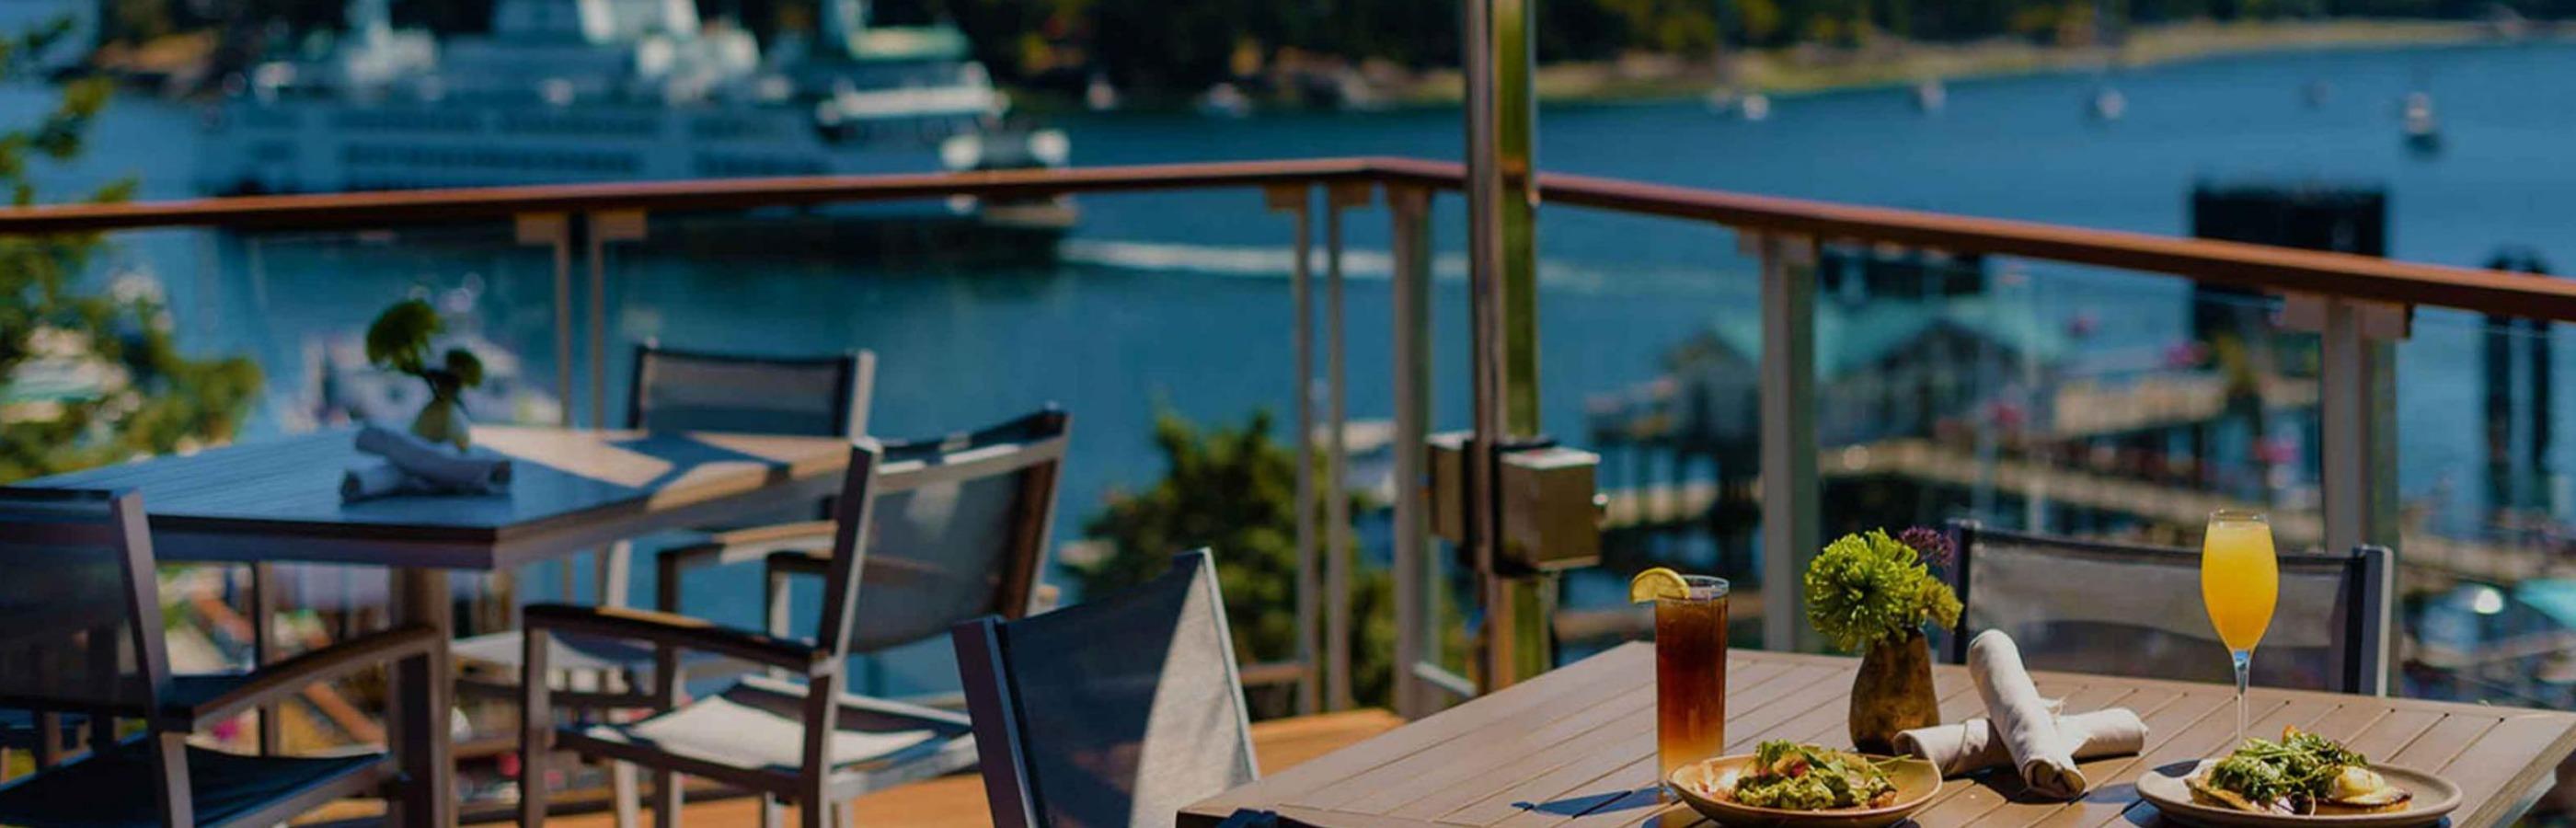 goterratrek.com - Dining by Friday Harbor